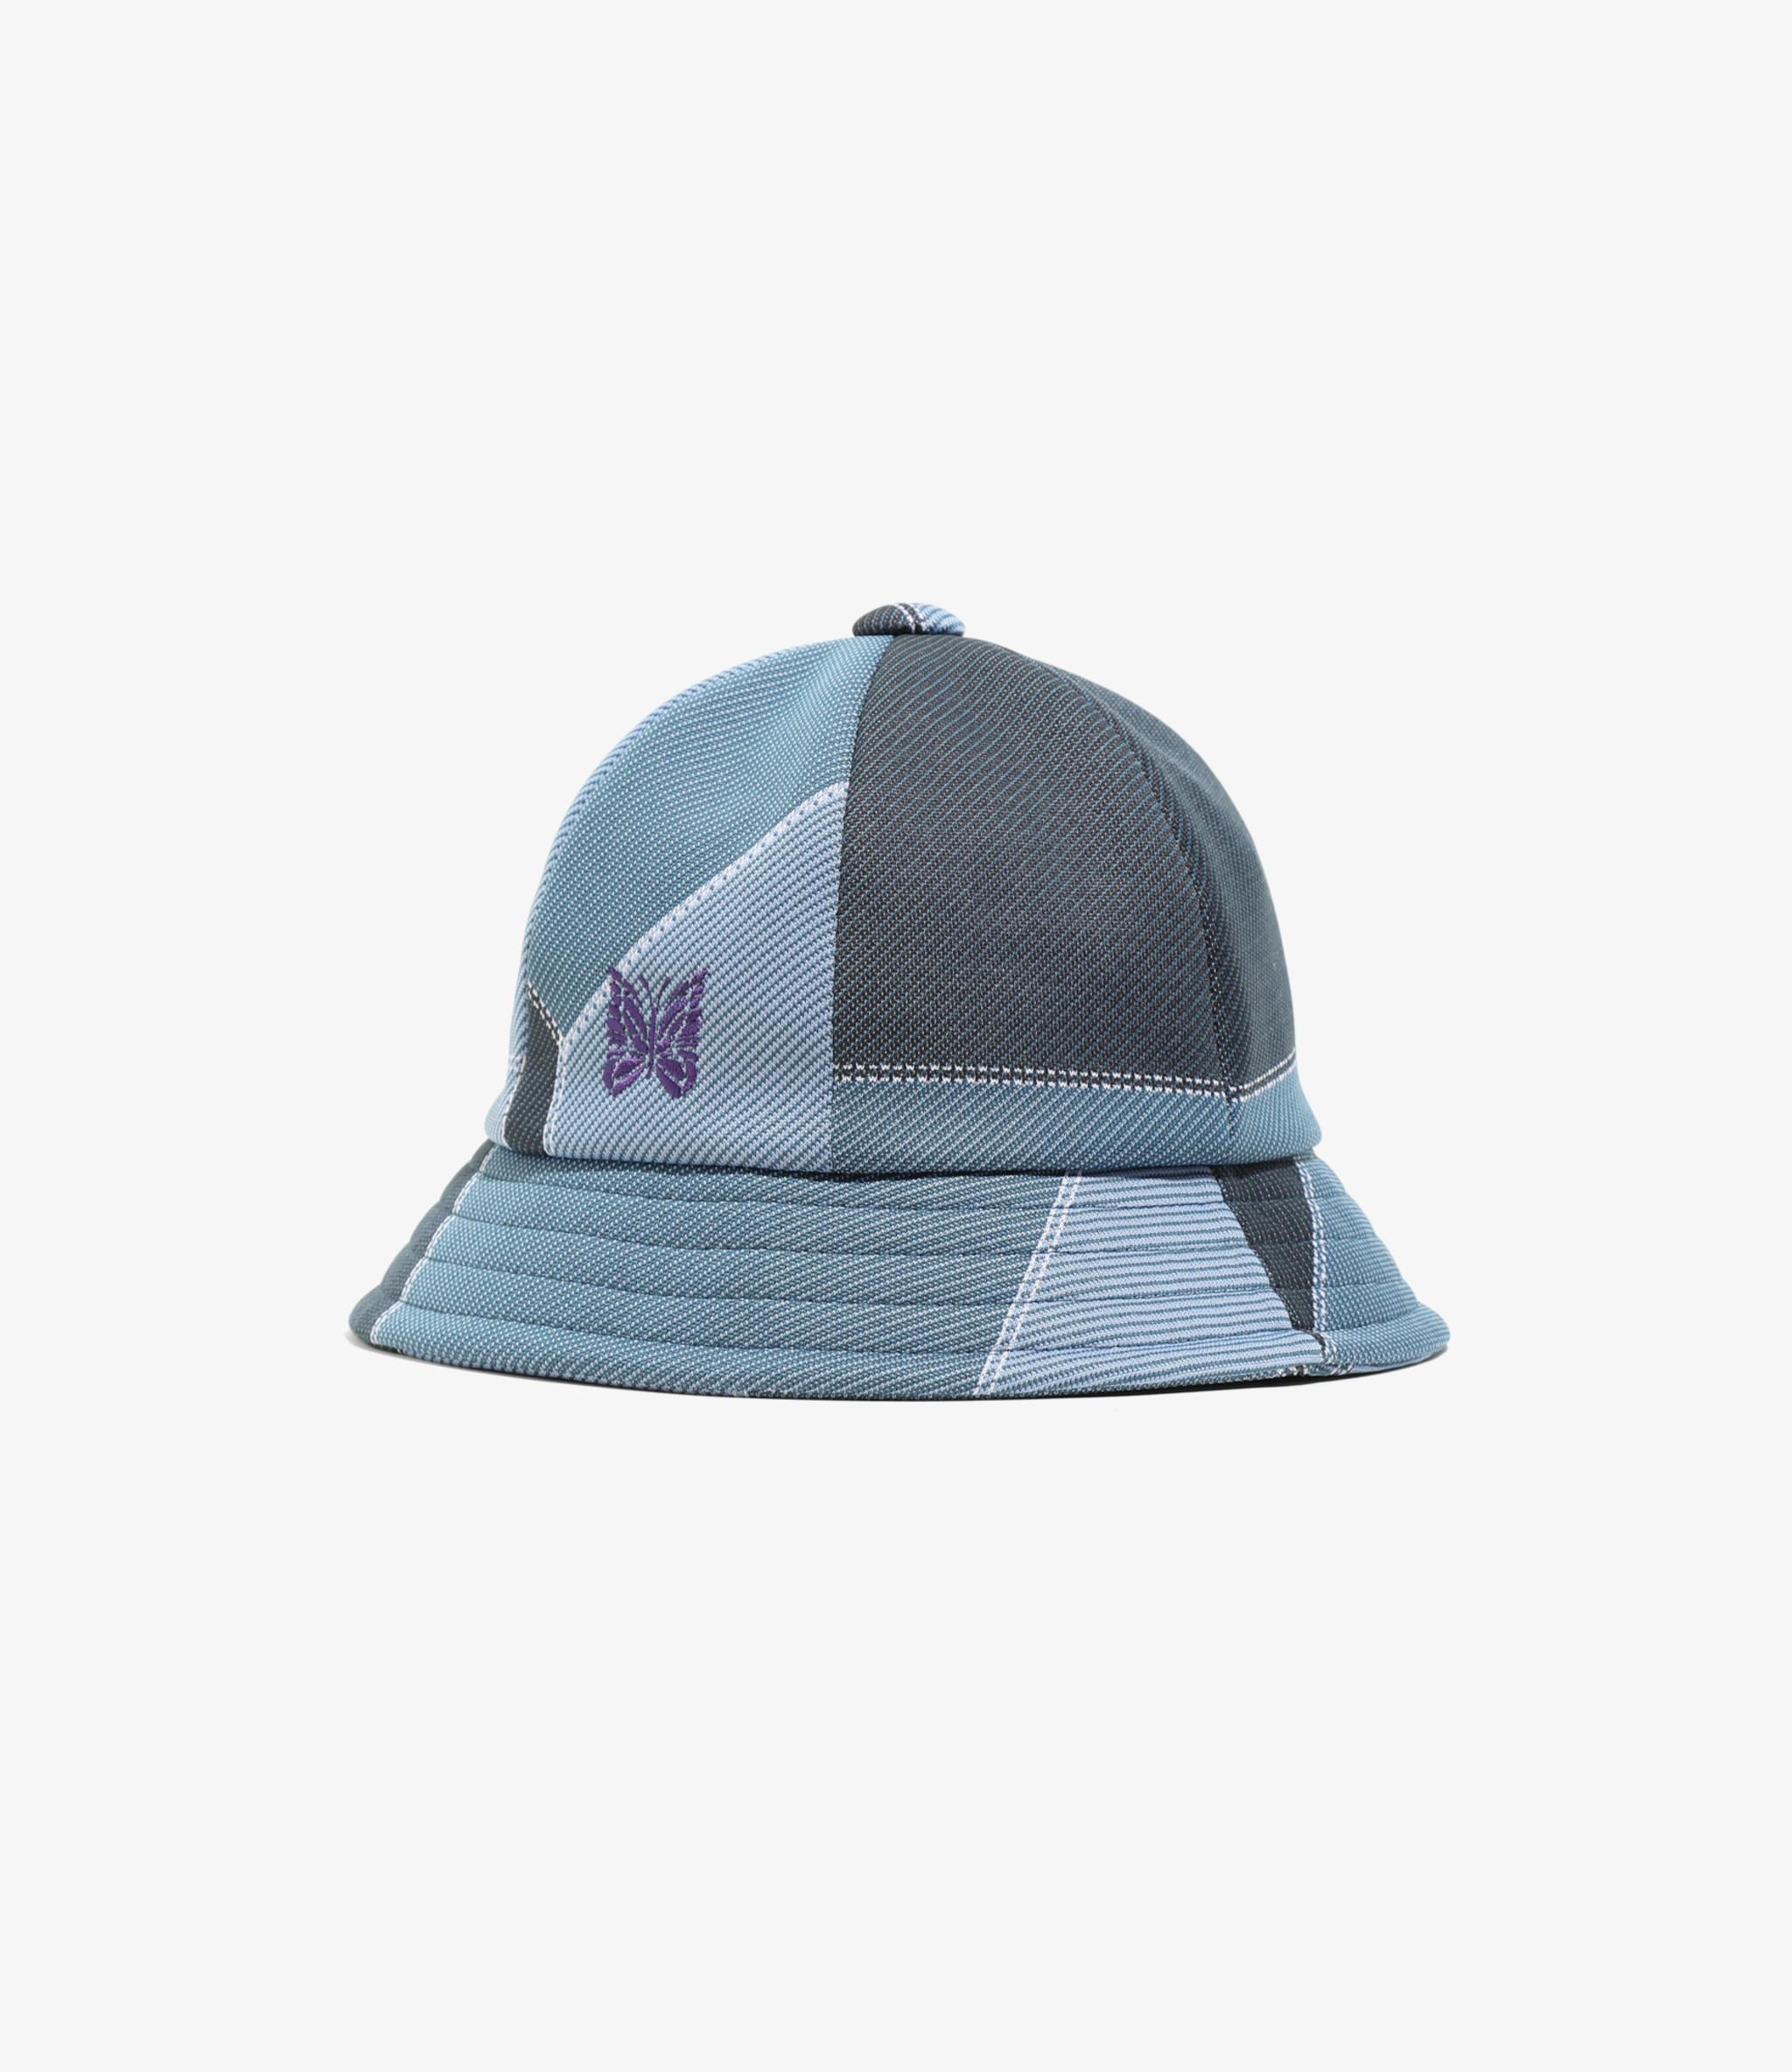 Needles Bermuda Hat  - Poly Jacquard. - Patchwork